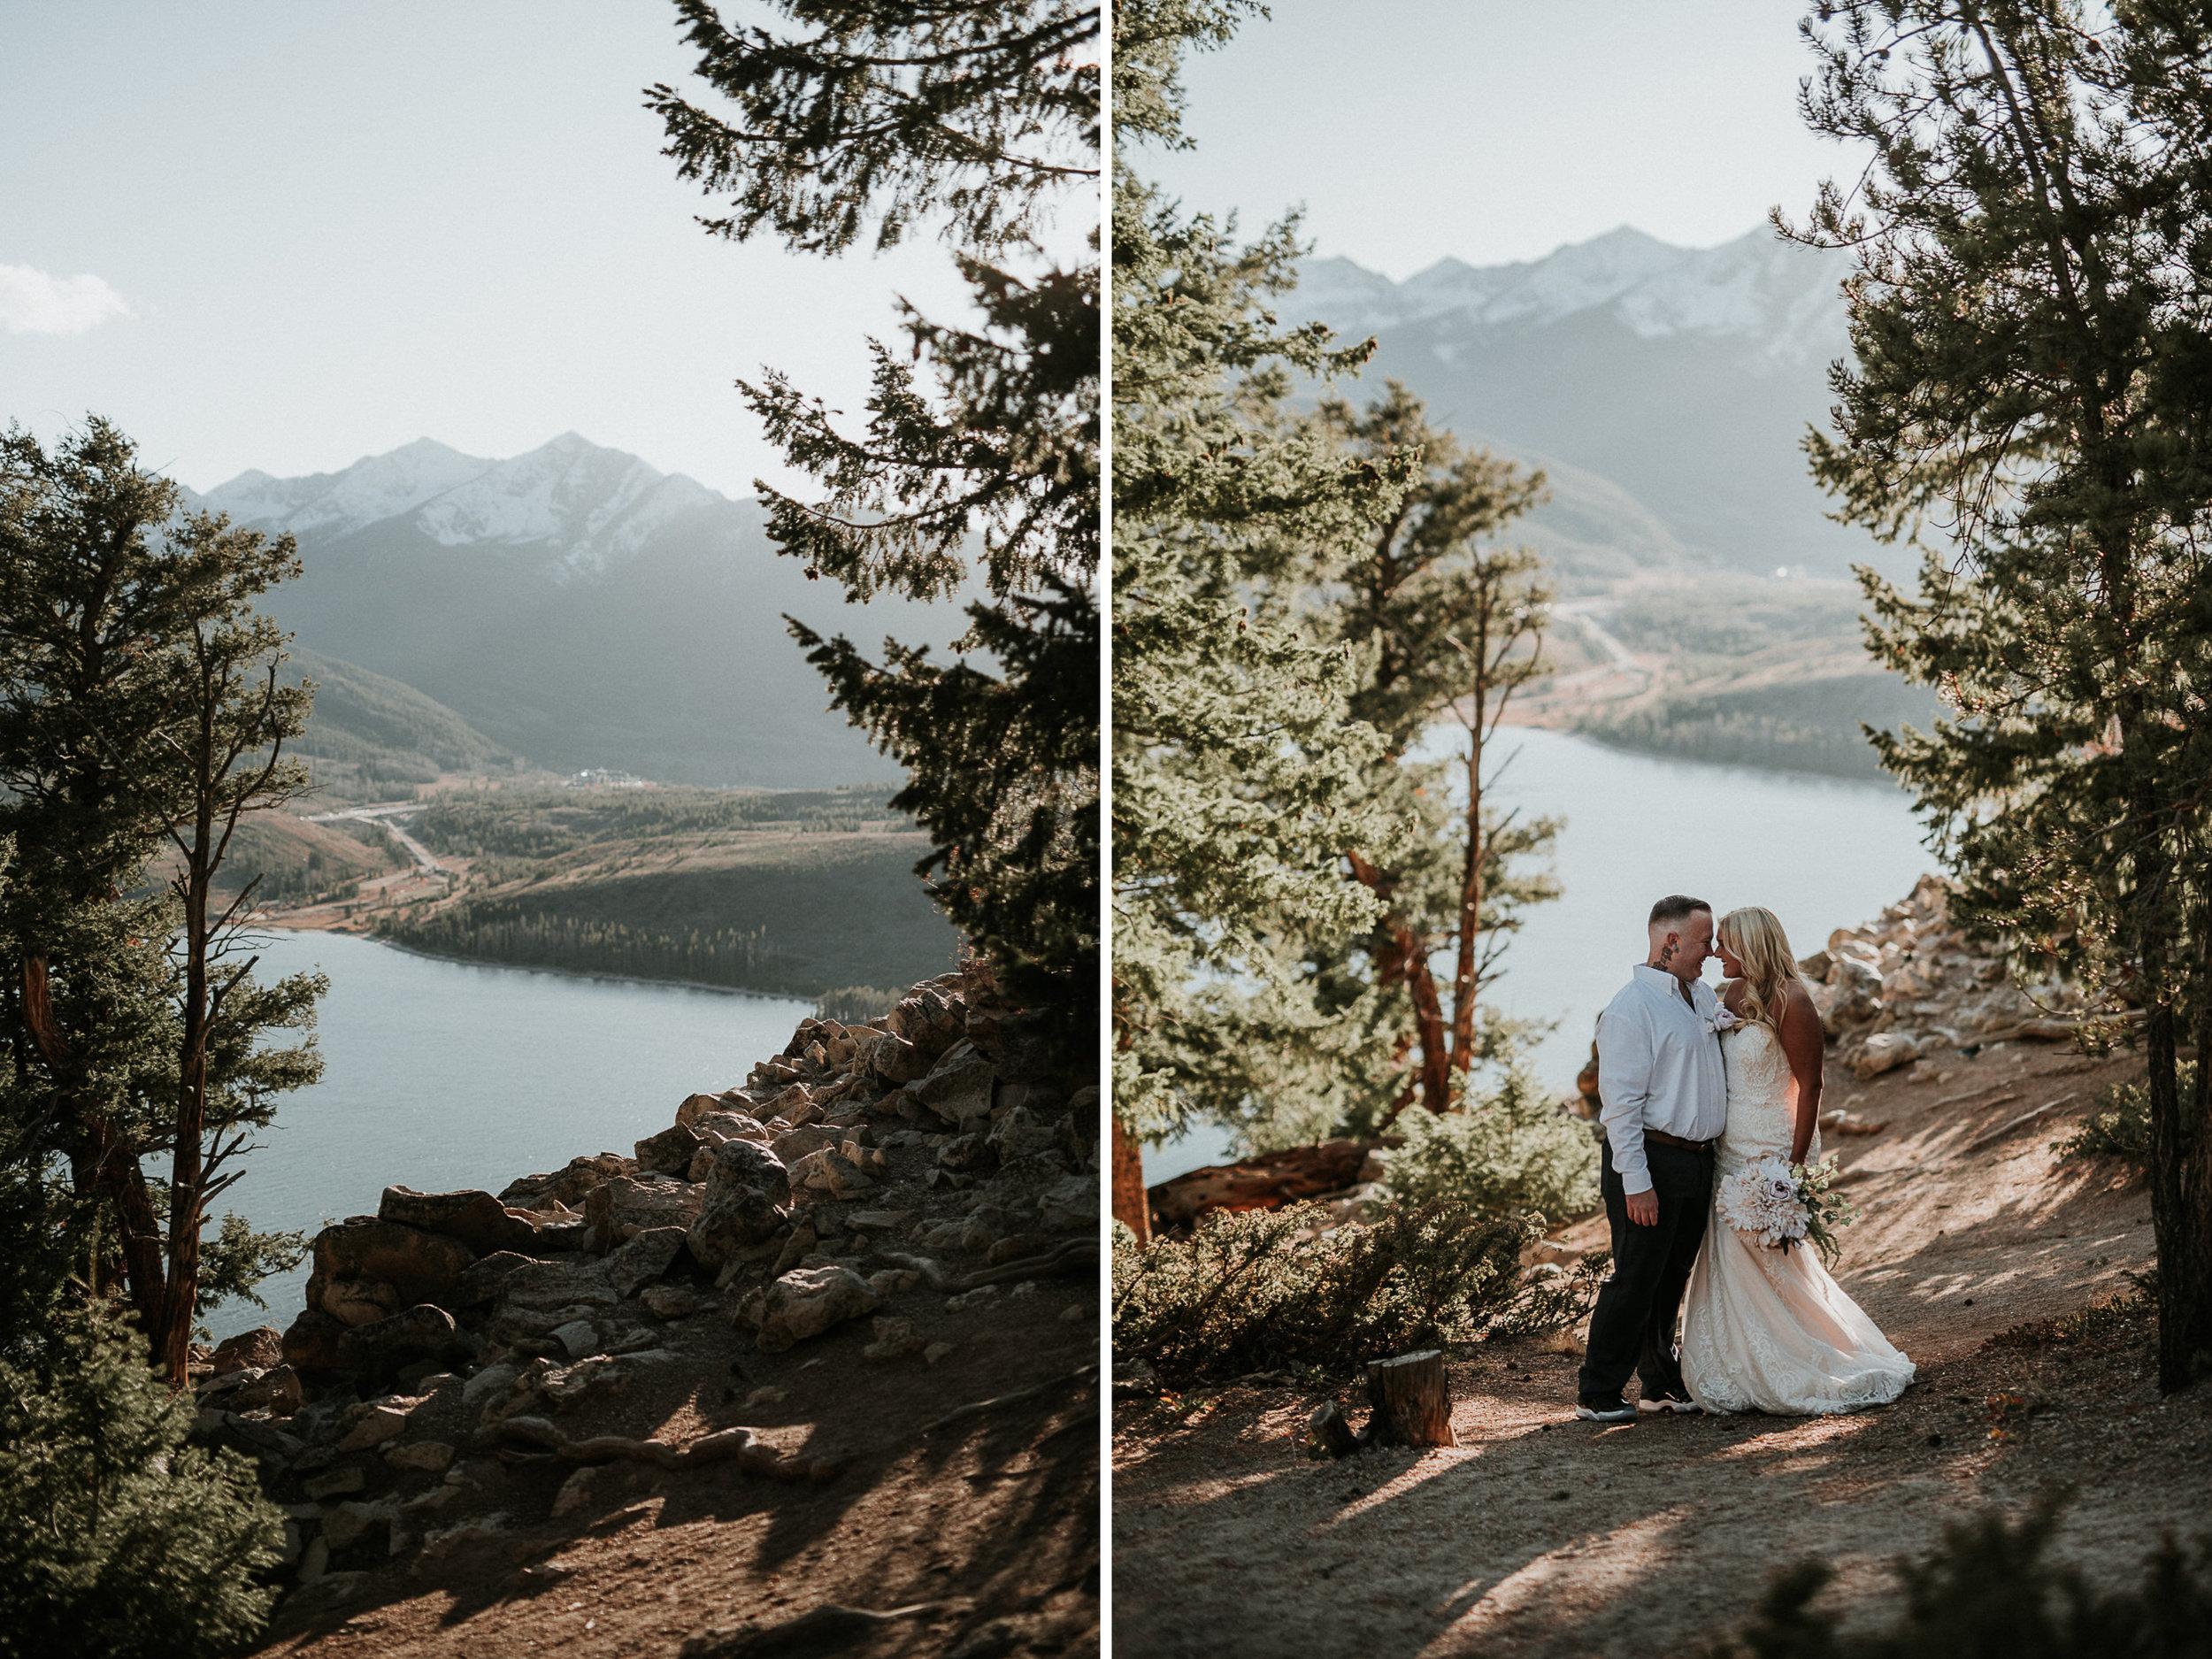 st. louis wedding photographer Zach&Rosalie - Lake Dillon CO Elopement 8.jpg